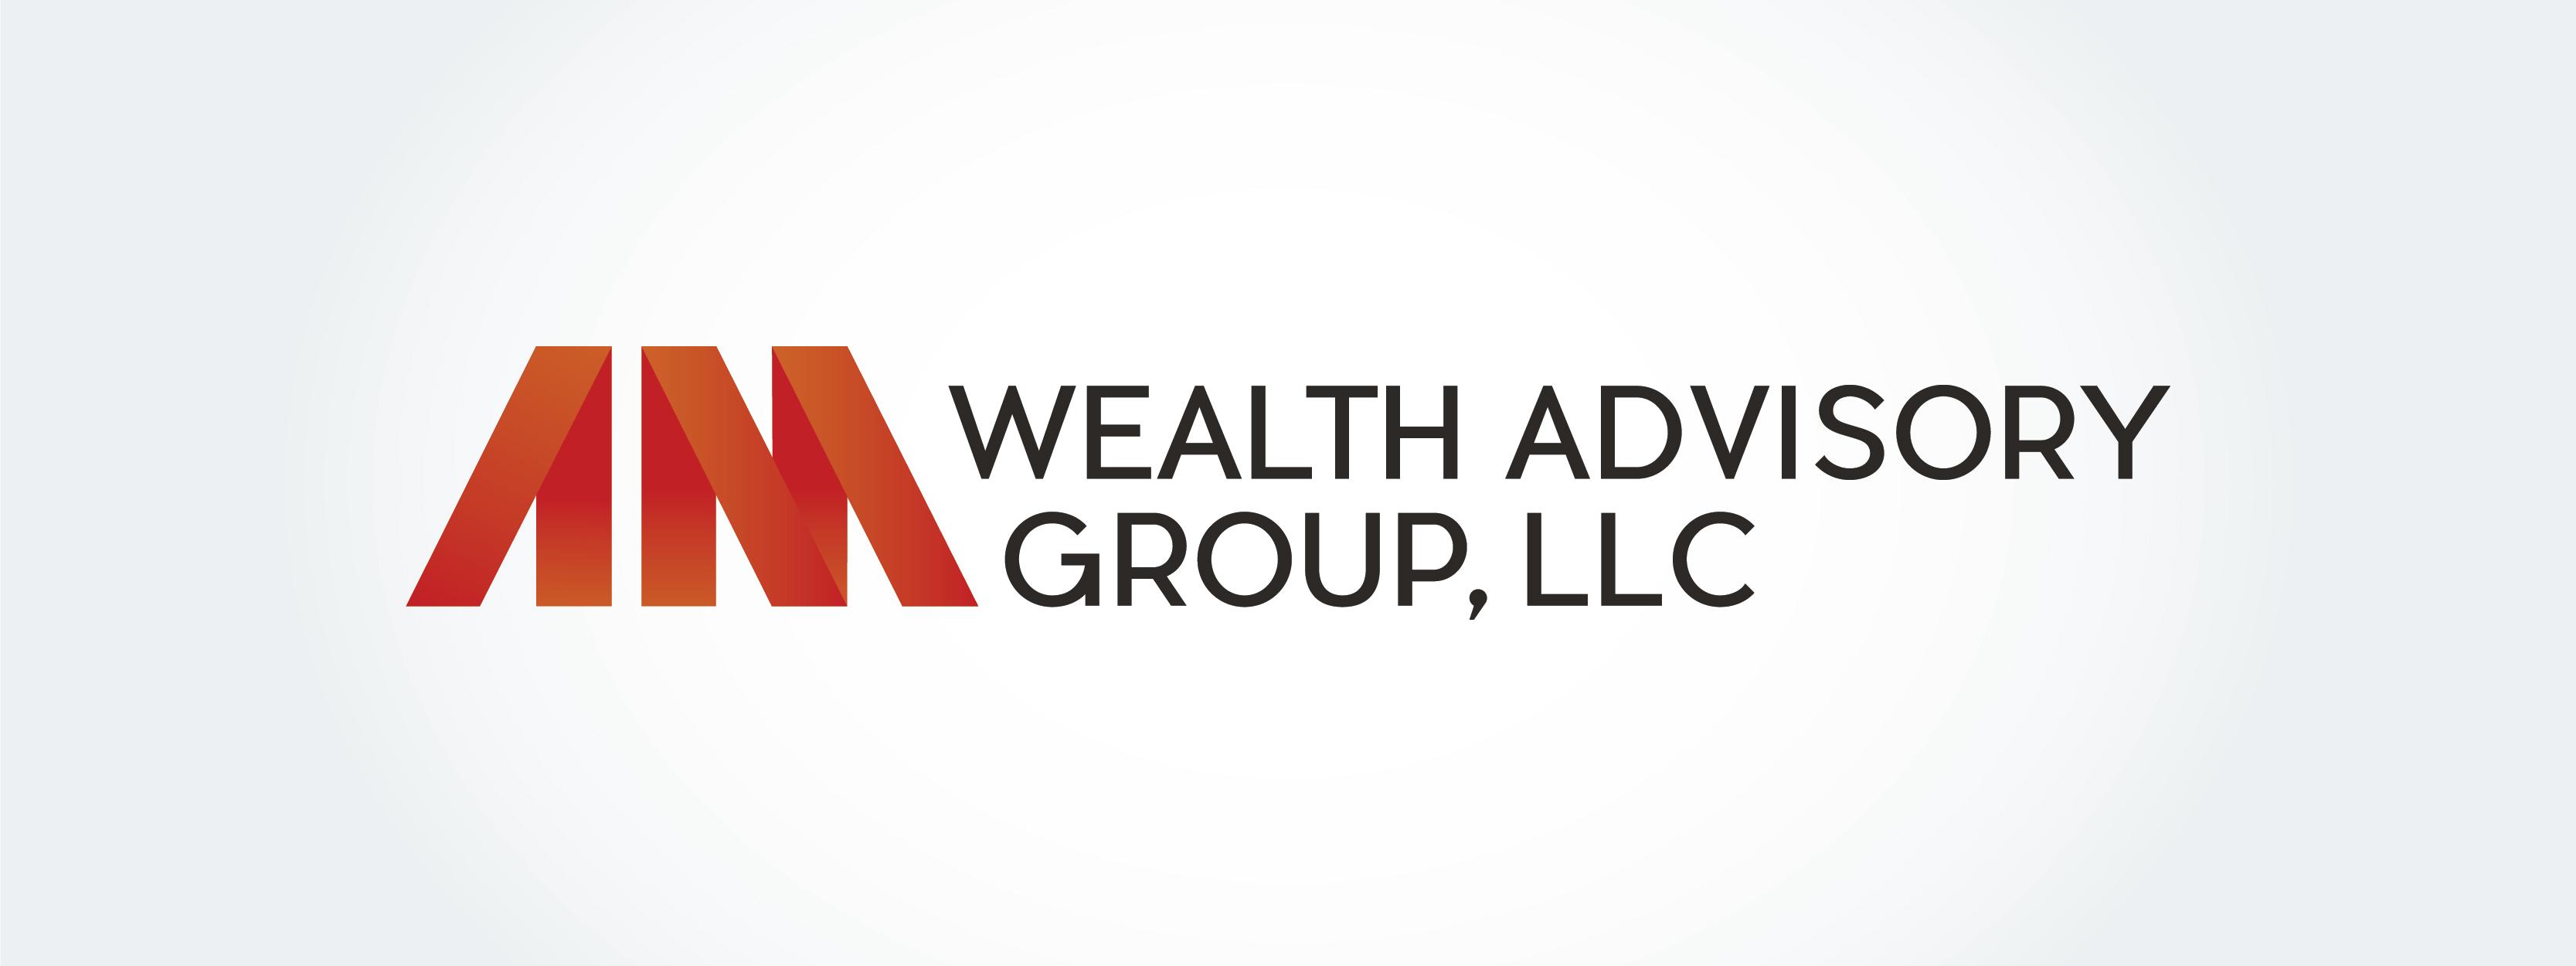 AM Wealth Advisory Group LLC logo Featured Image